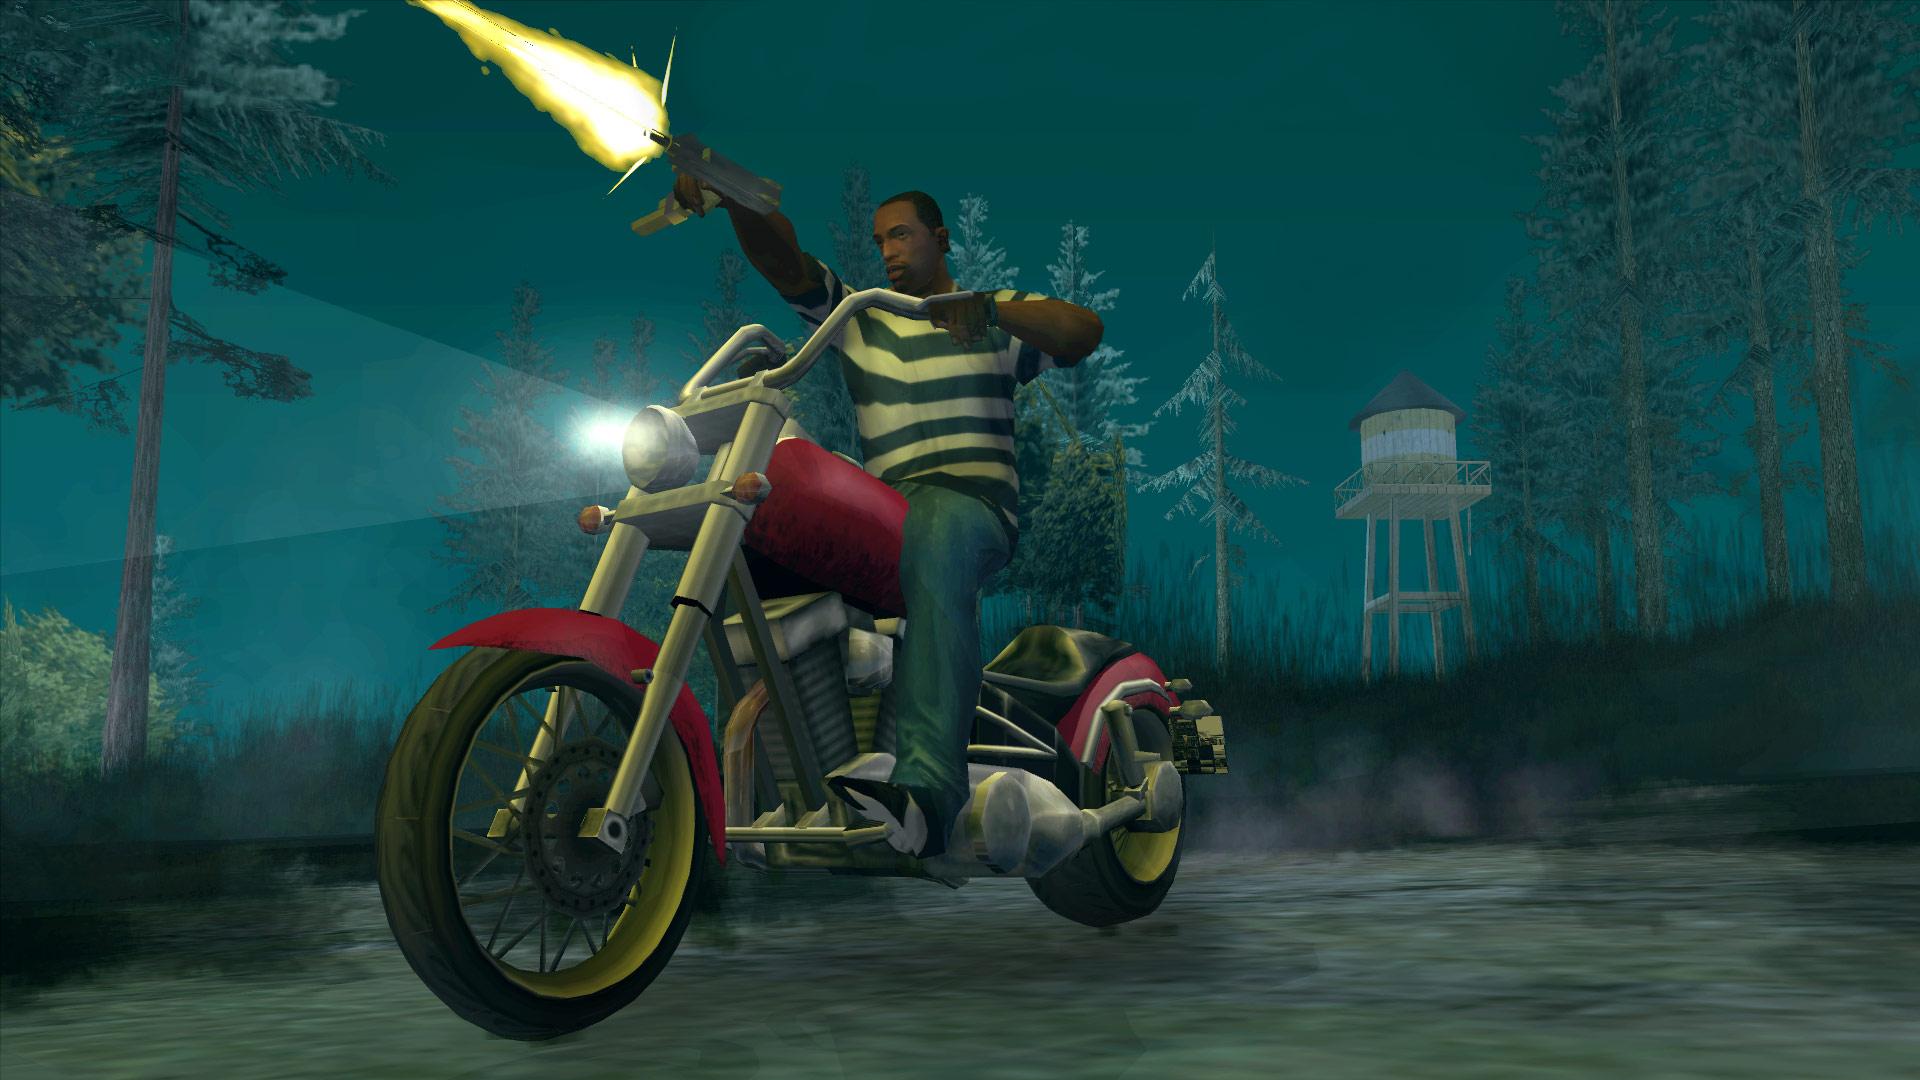 CJ firing a gun while riding a motorcycle